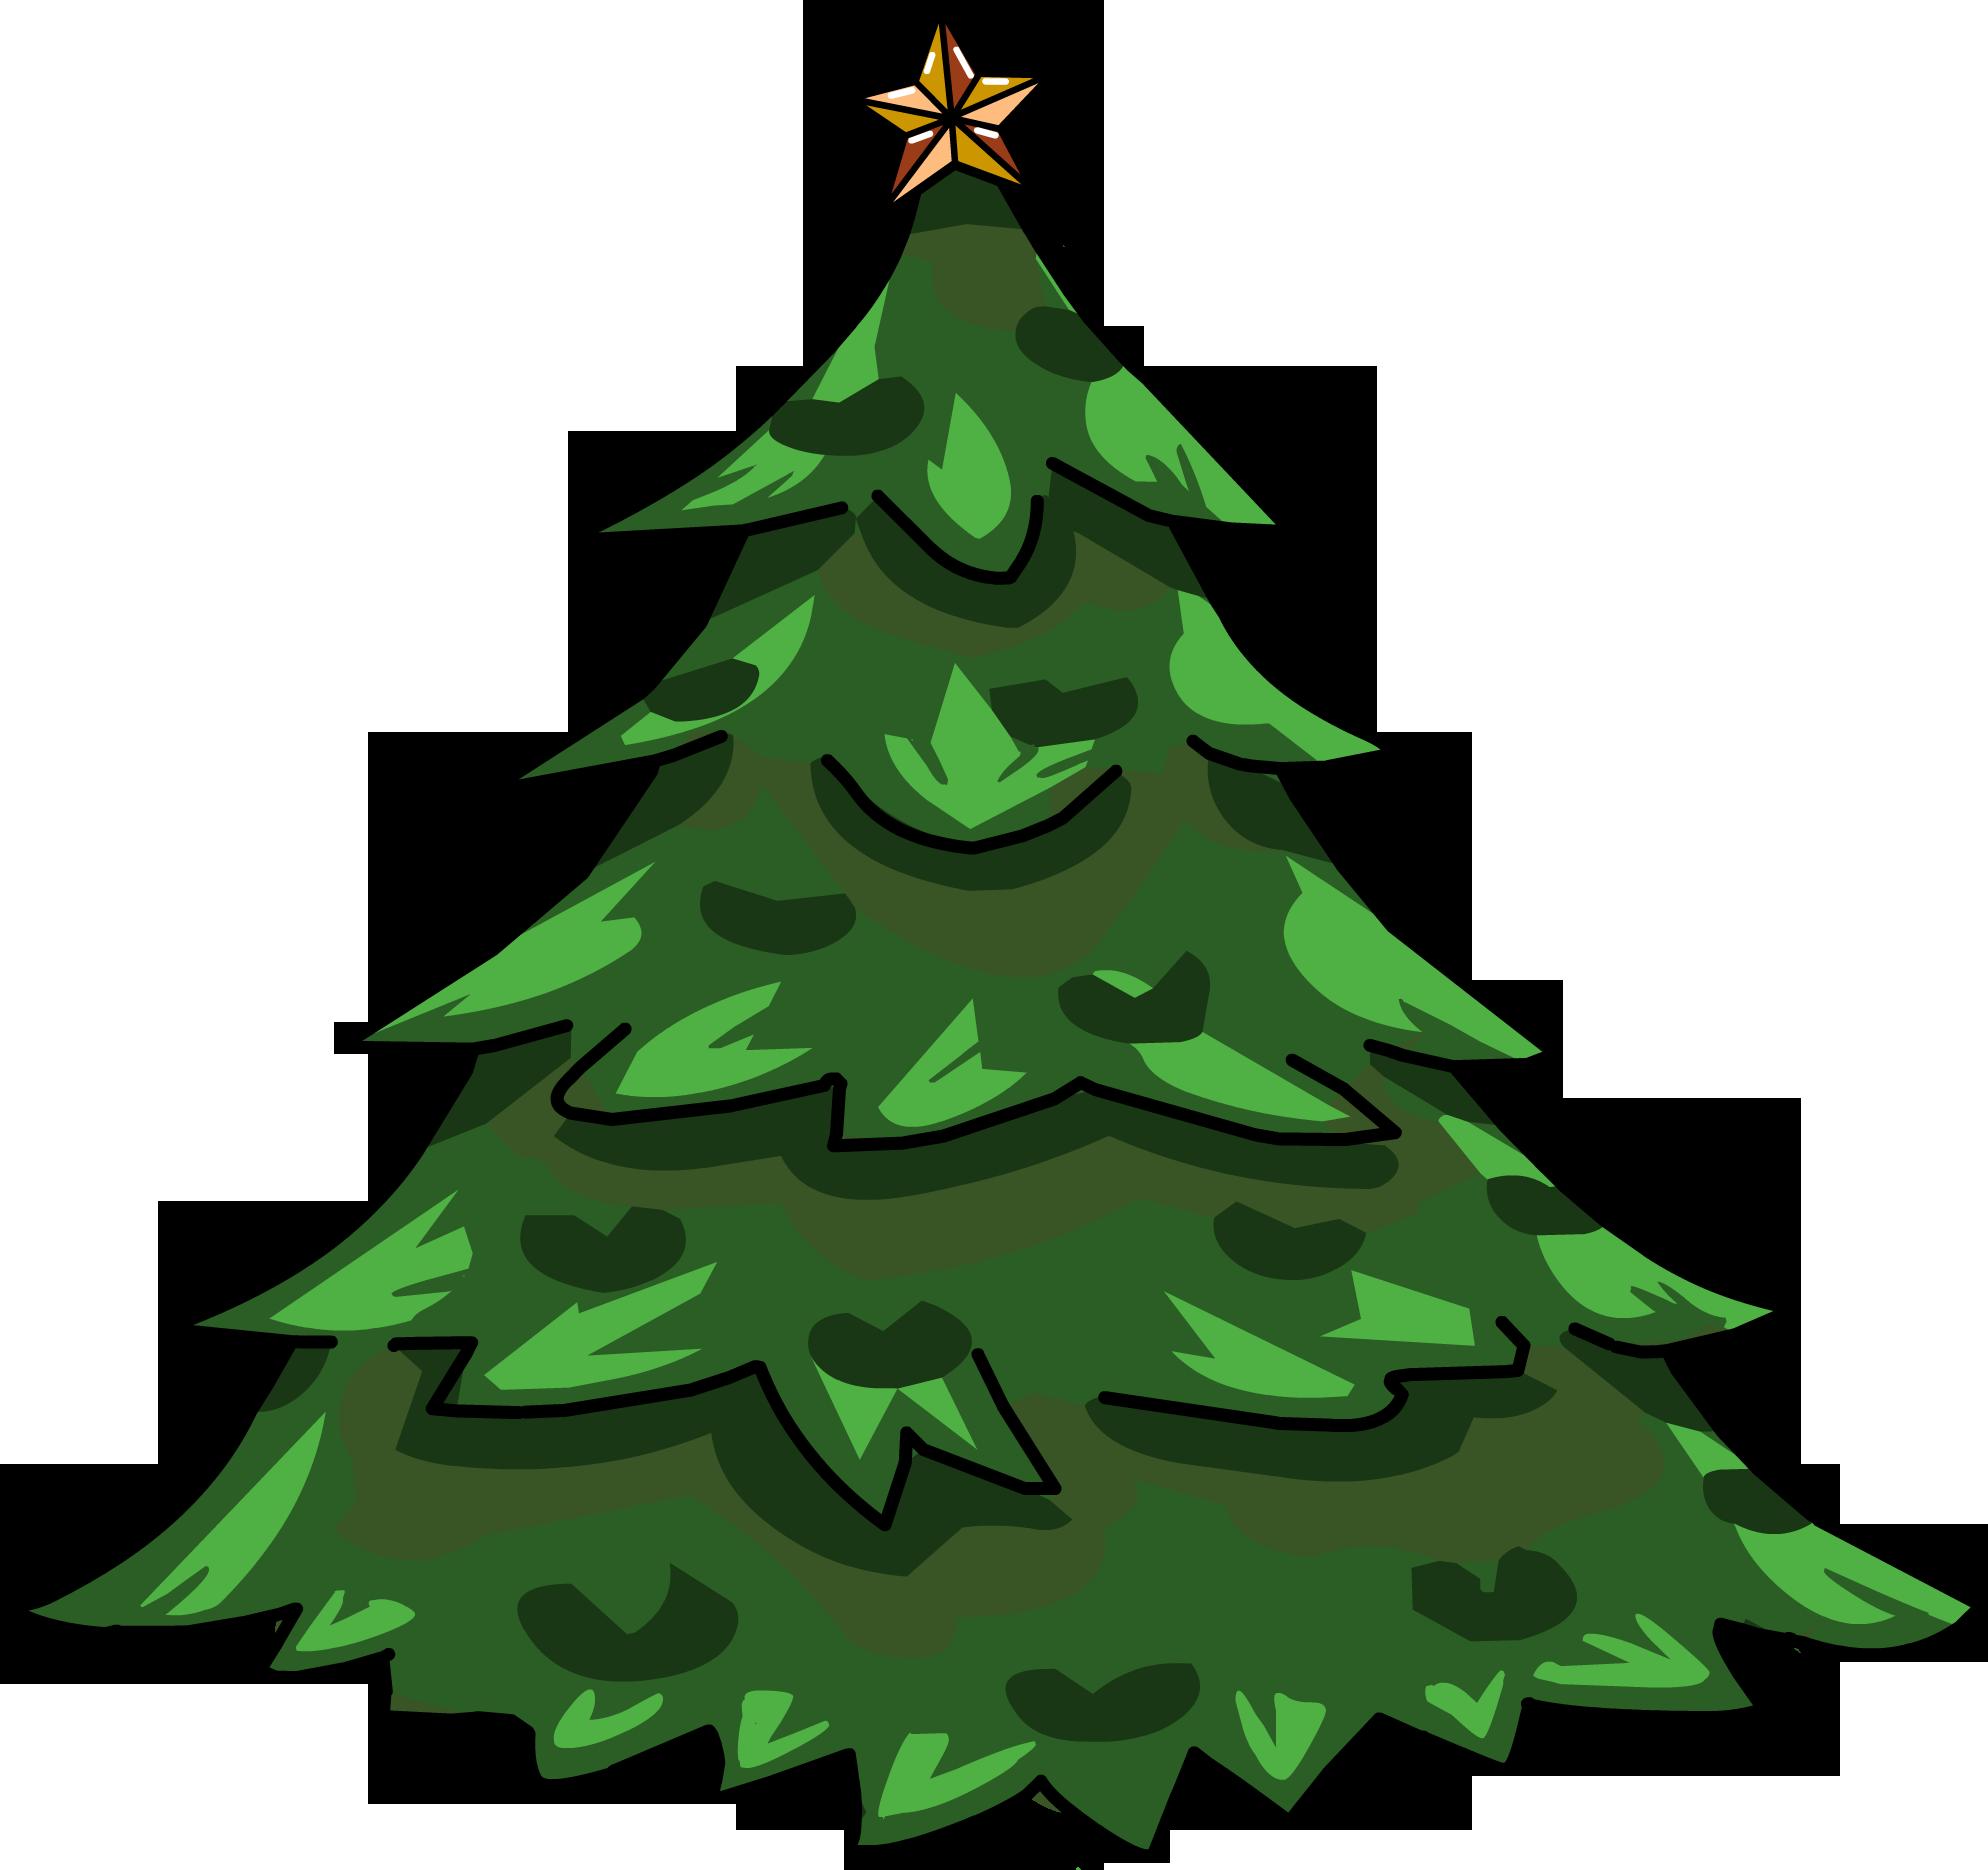 Penguin Christmas Tree: Club Penguin Wiki